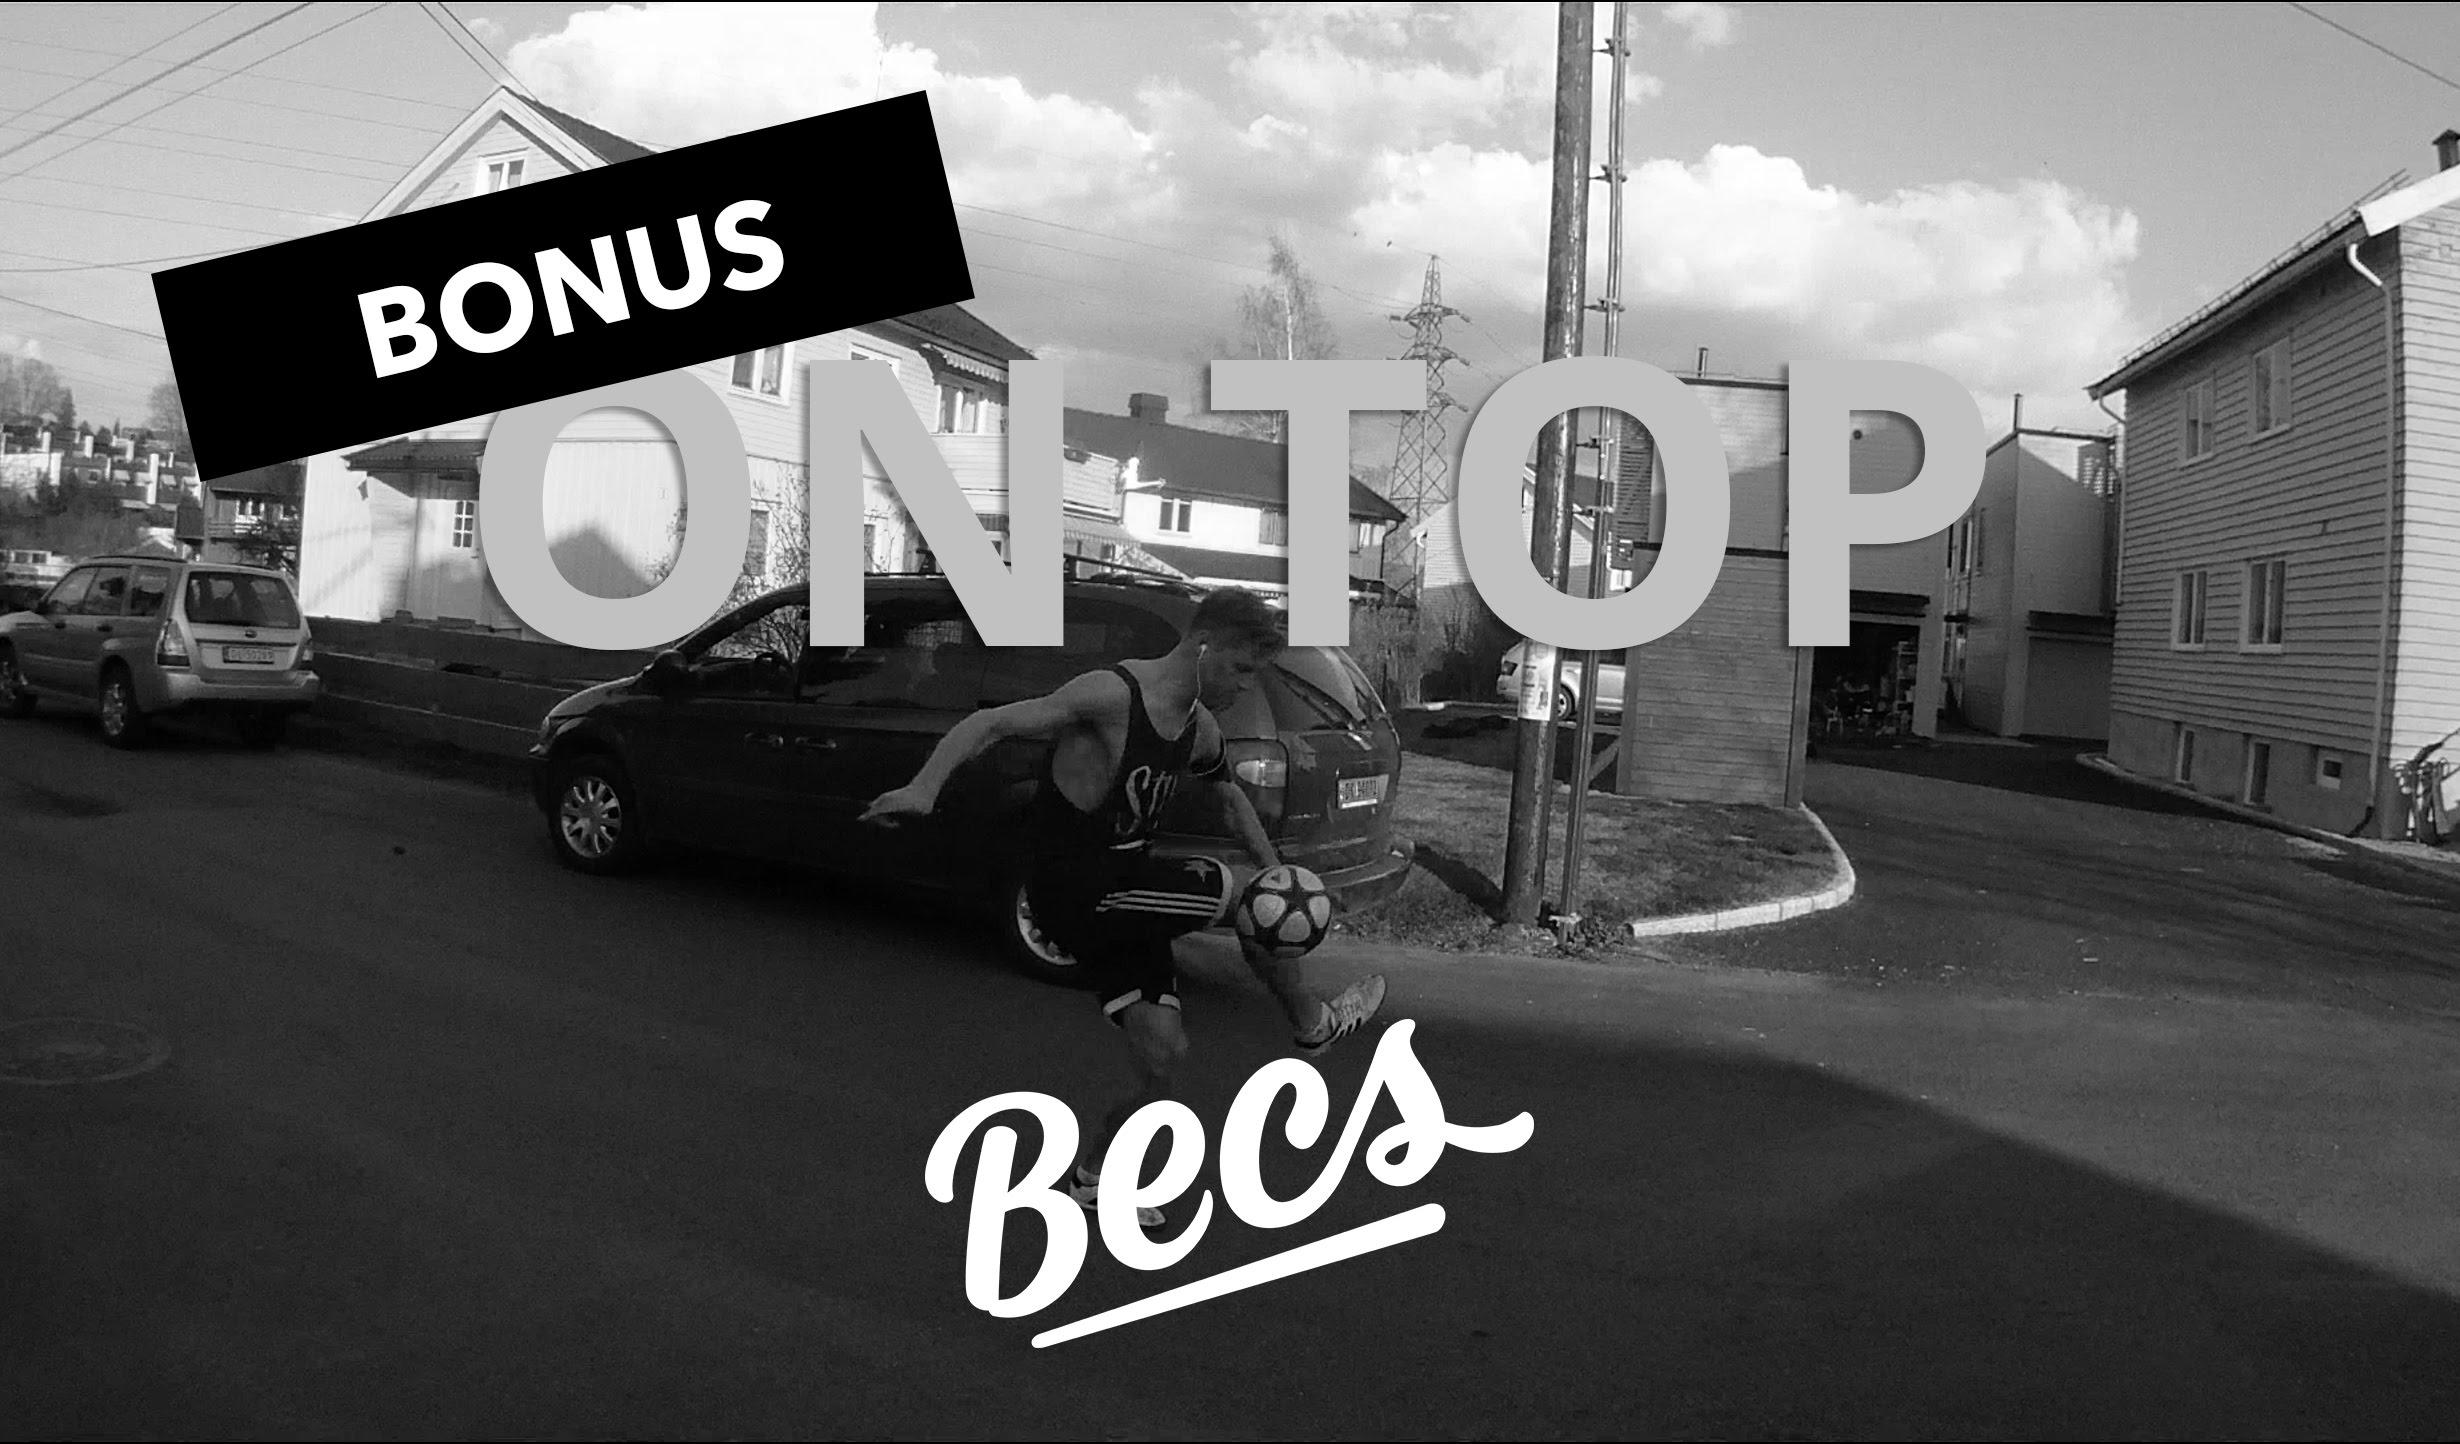 Tobias Becs – On Top (Bonus clip)